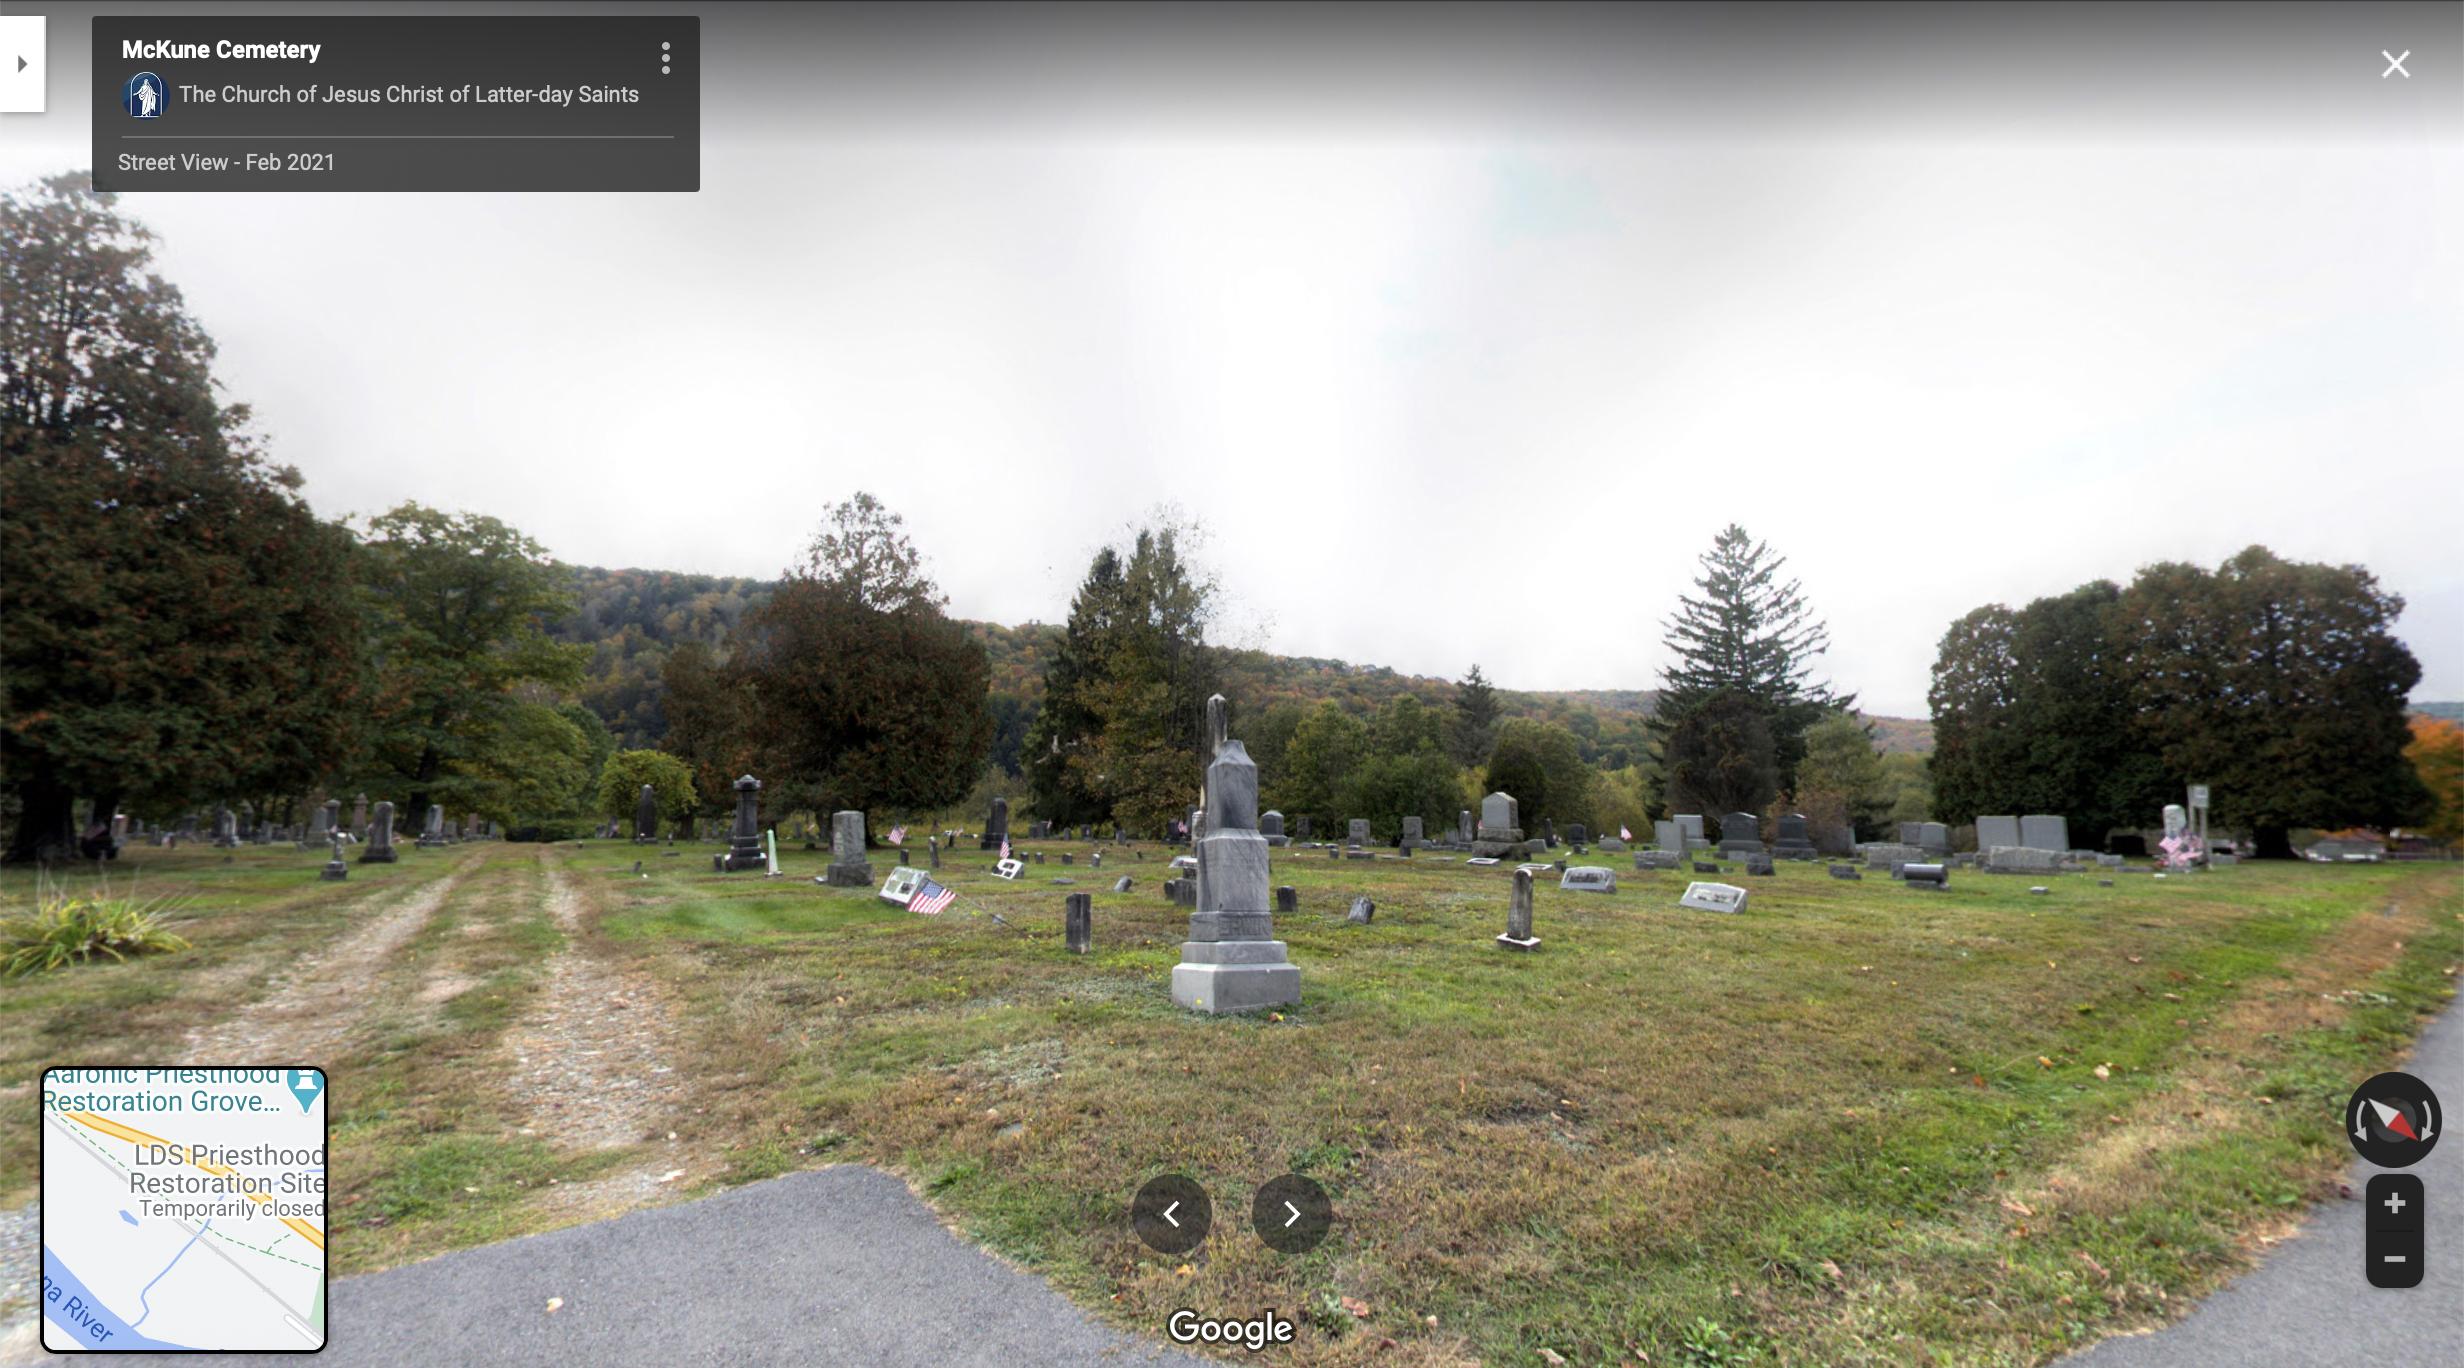 Screenshot of the Google Maps 360 view of McKune Cemetery